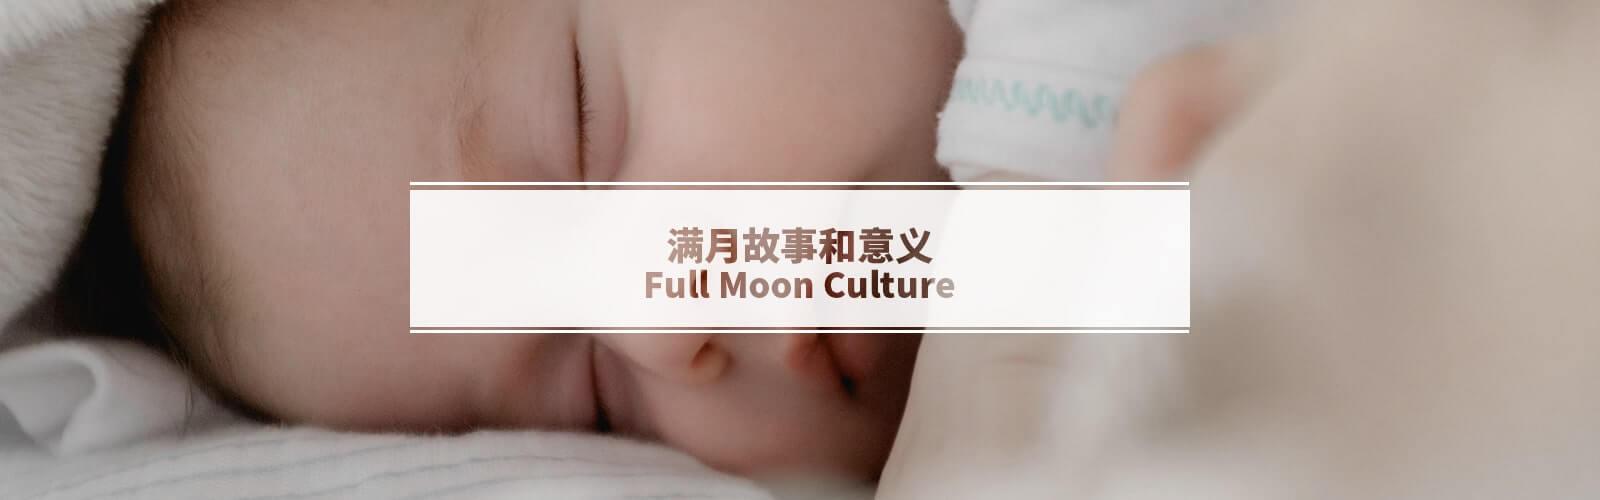 Full Moon Culture